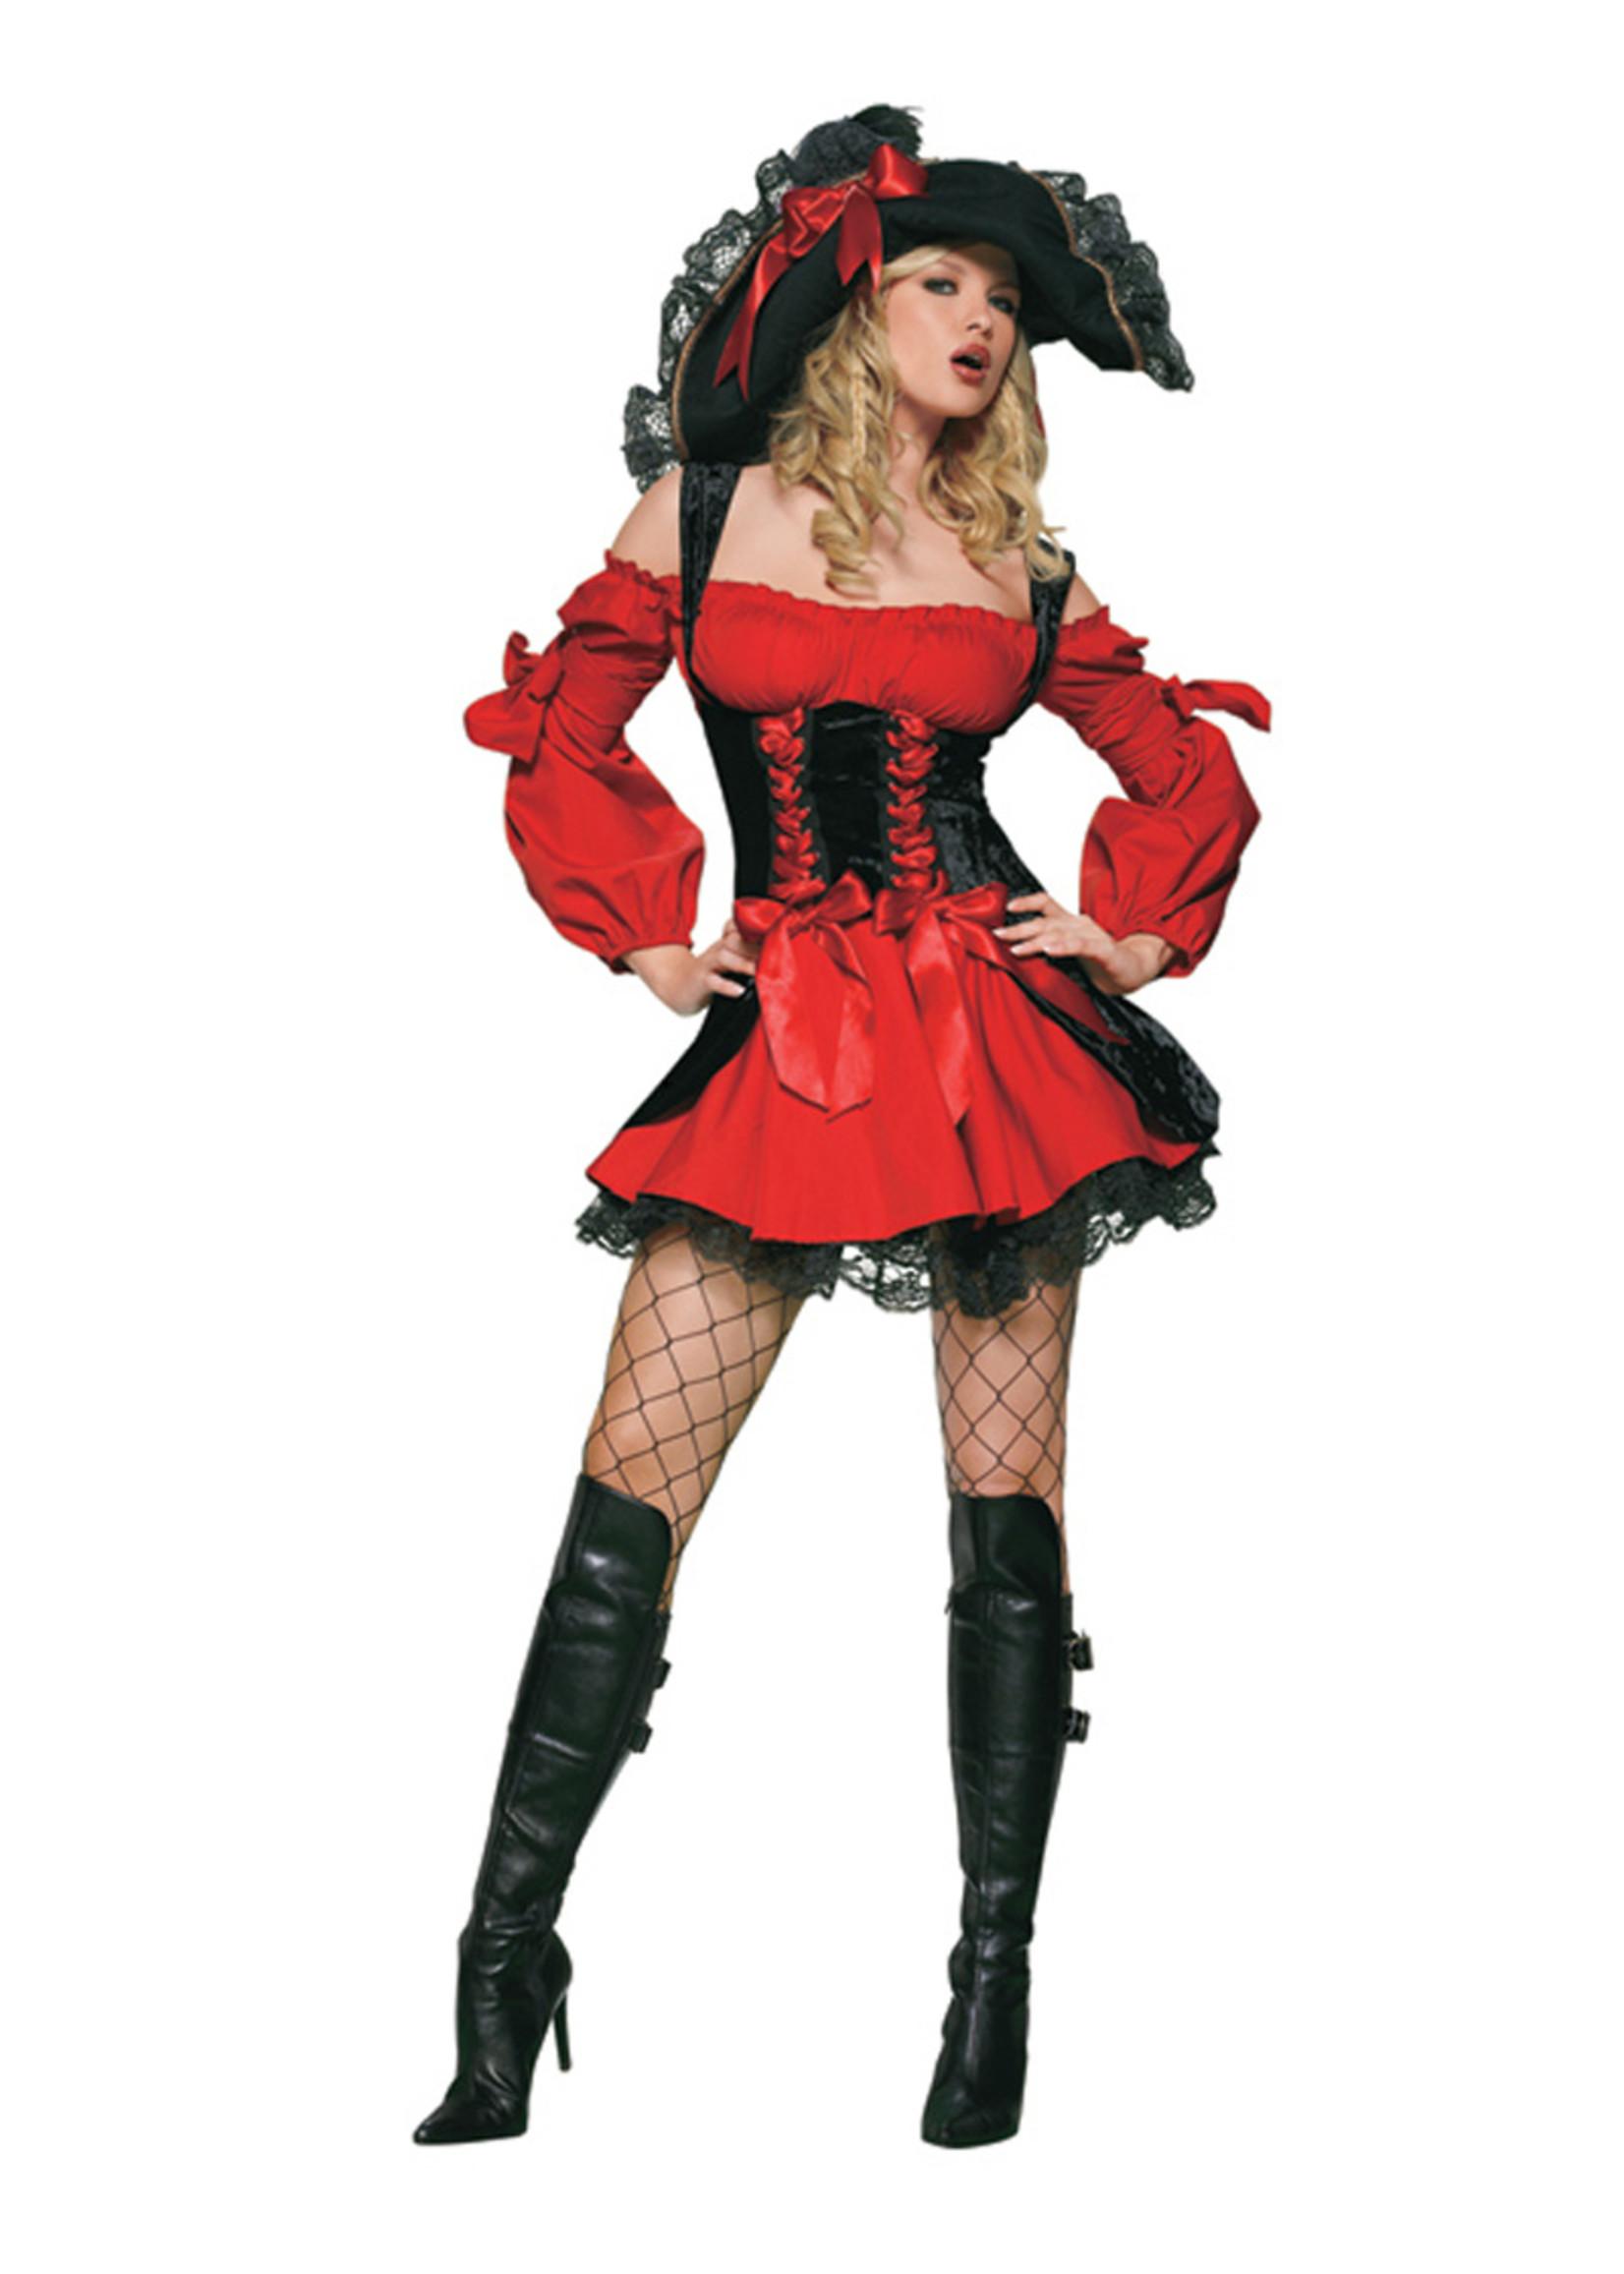 Vixen Pirate Costume - Women's